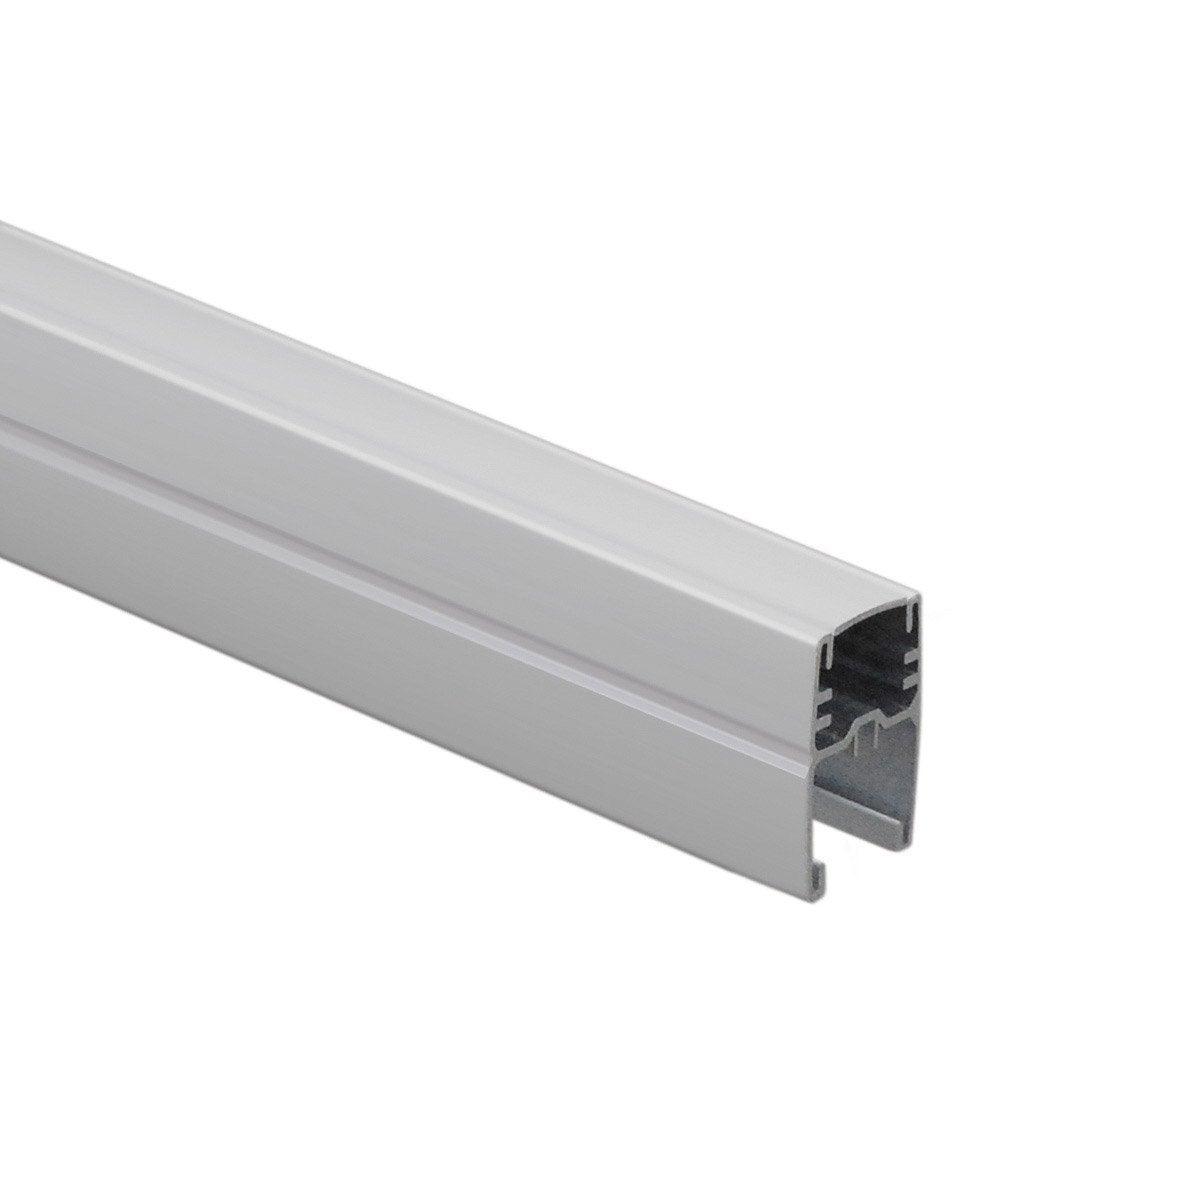 Profil de finition en aluminium prenium coloris blanc cm leroy merlin - Prieel aluminium leroy merlin ...